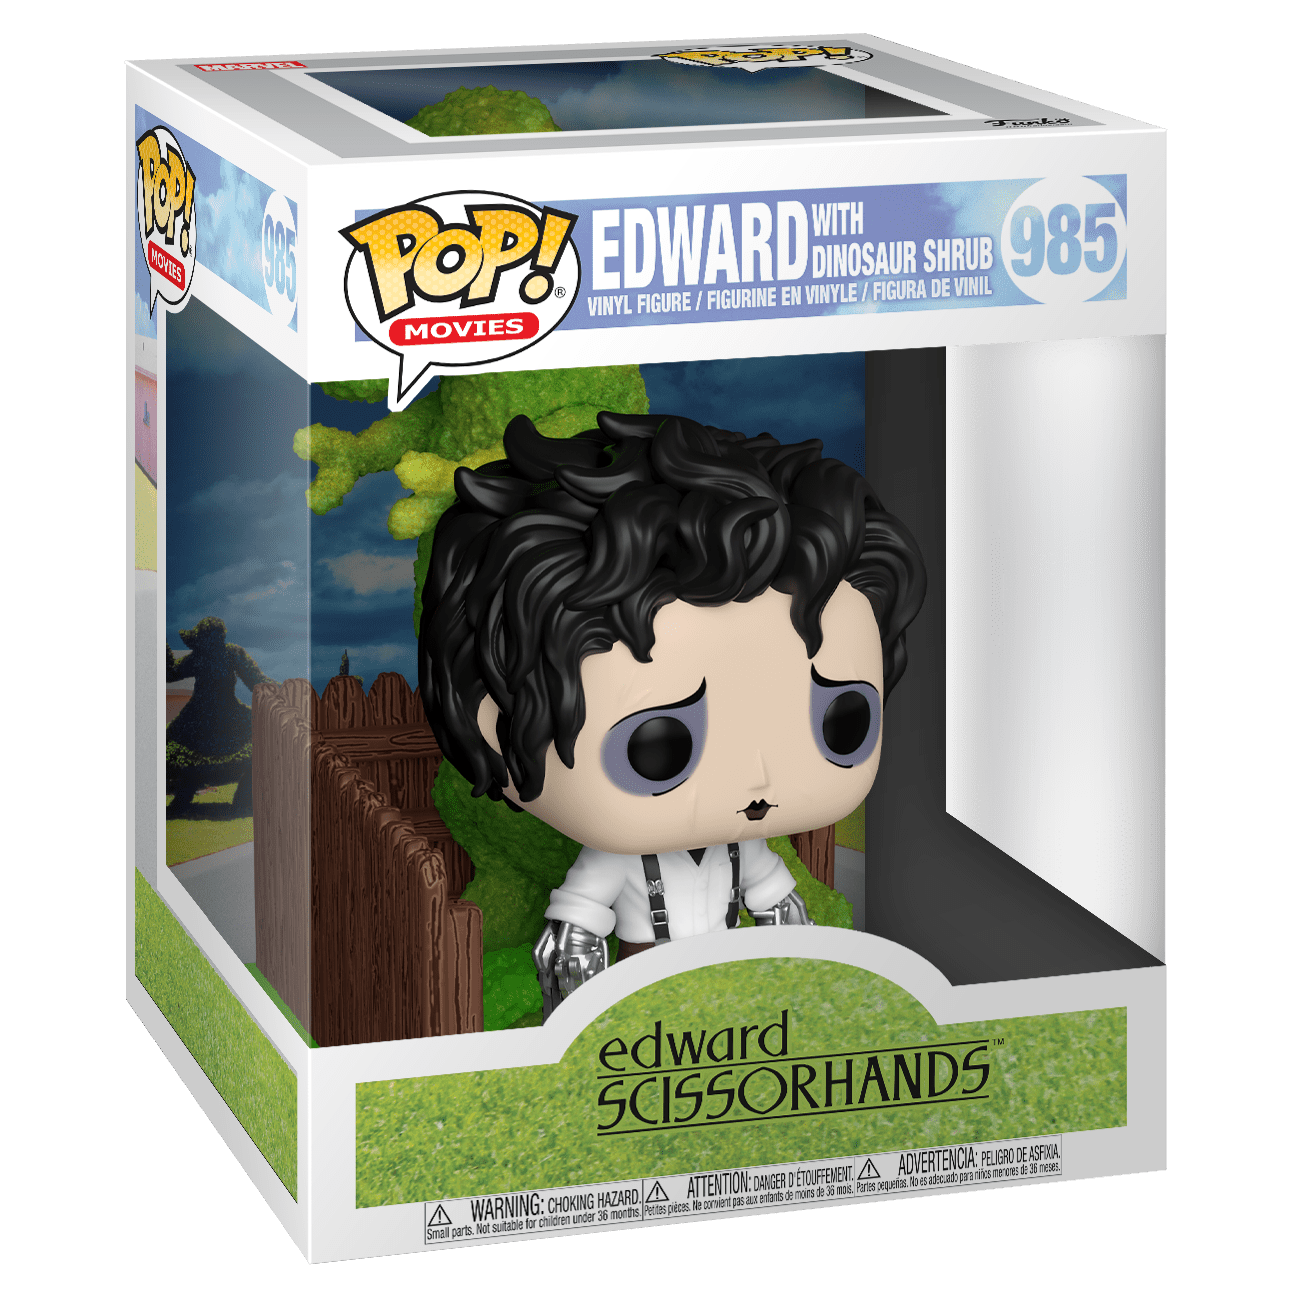 Funko Edward Scissorhands: Edward & Dino Hedge Deluxe Funko POP! #985